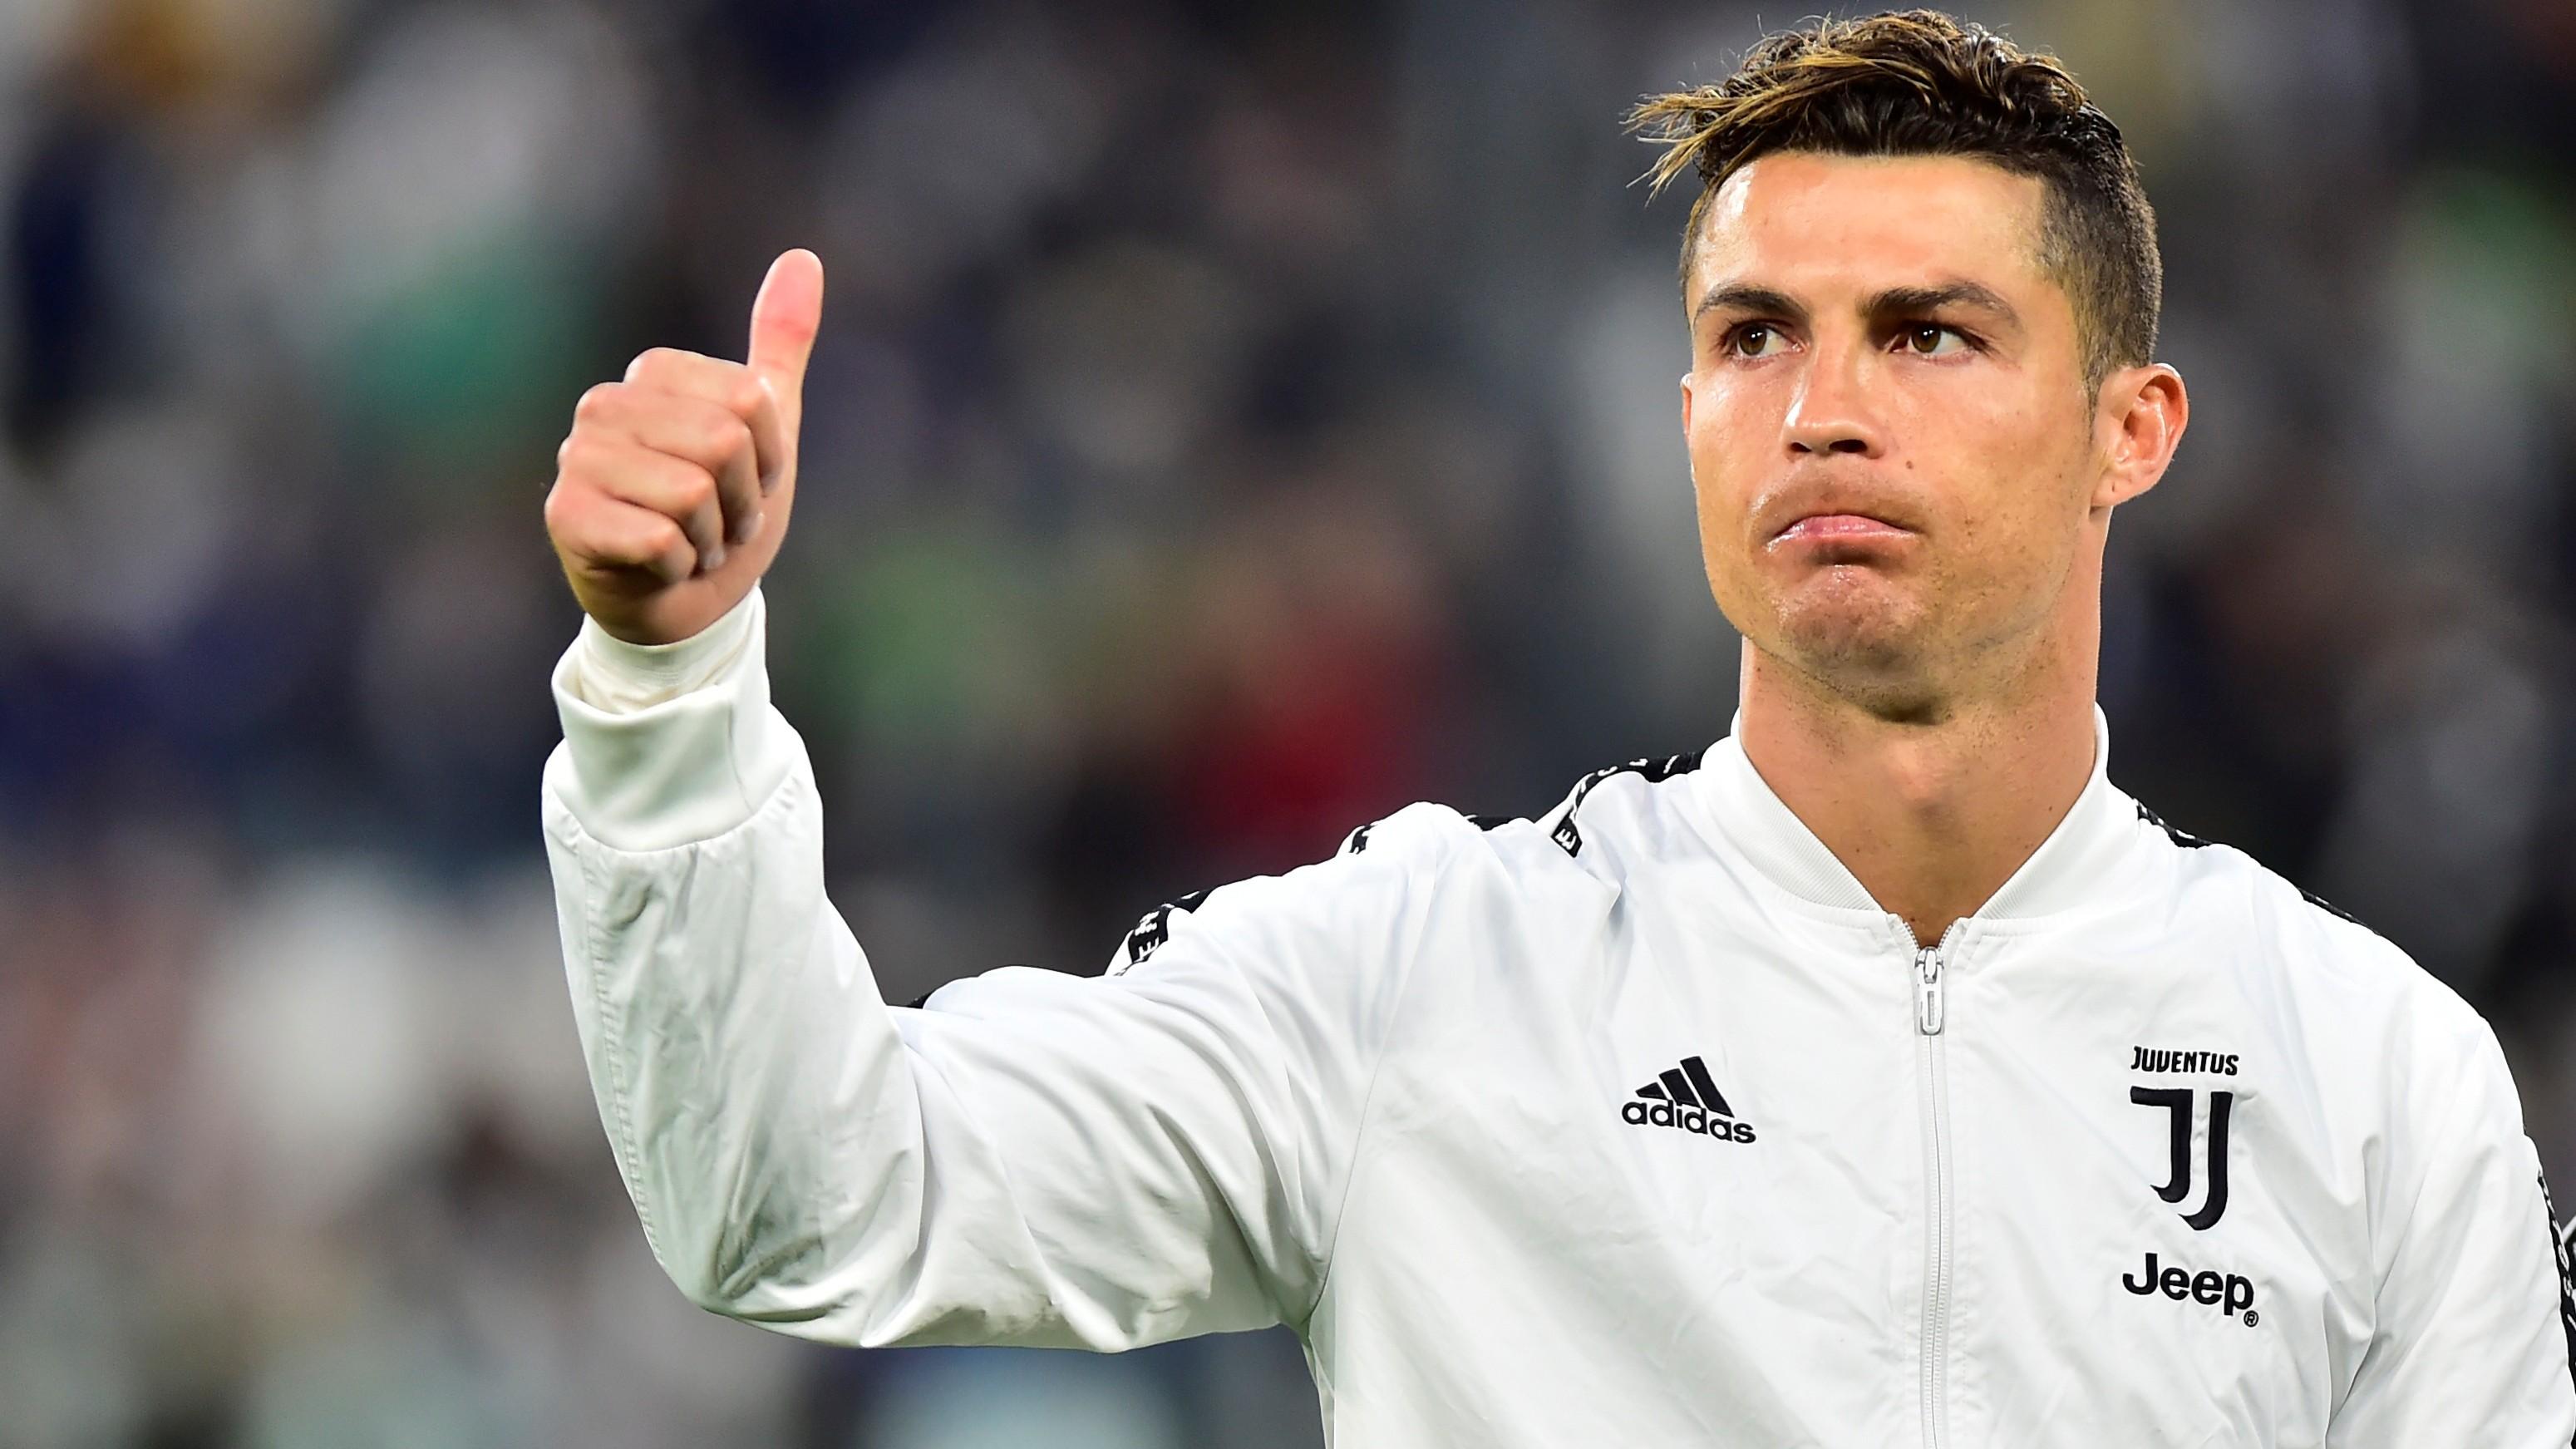 Juventus Turin: Cristiano Ronaldo zeigt das neue Trikot in ...